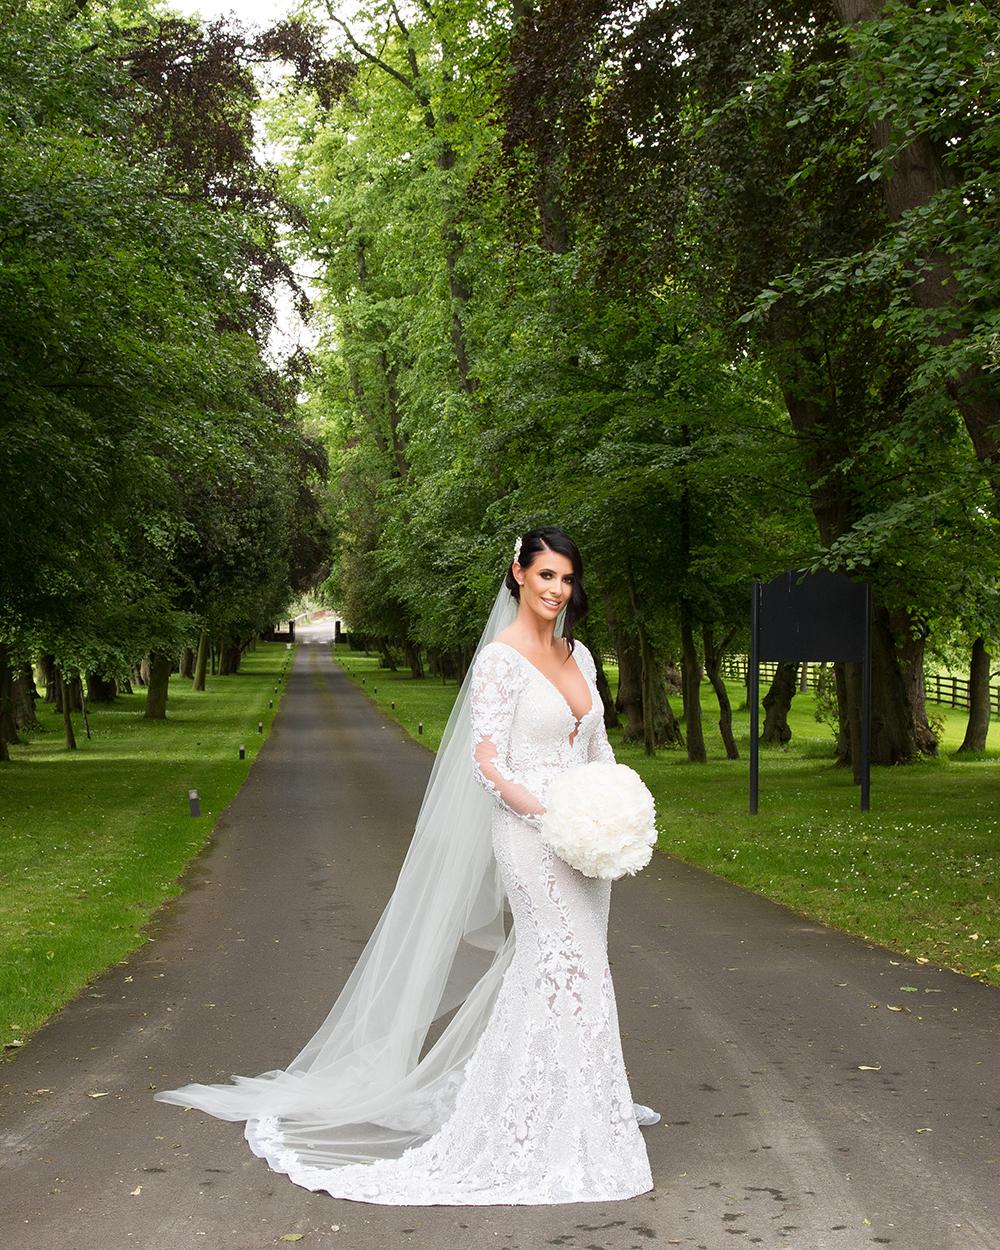 Julie Lamont wedding at Carlowrie Castle